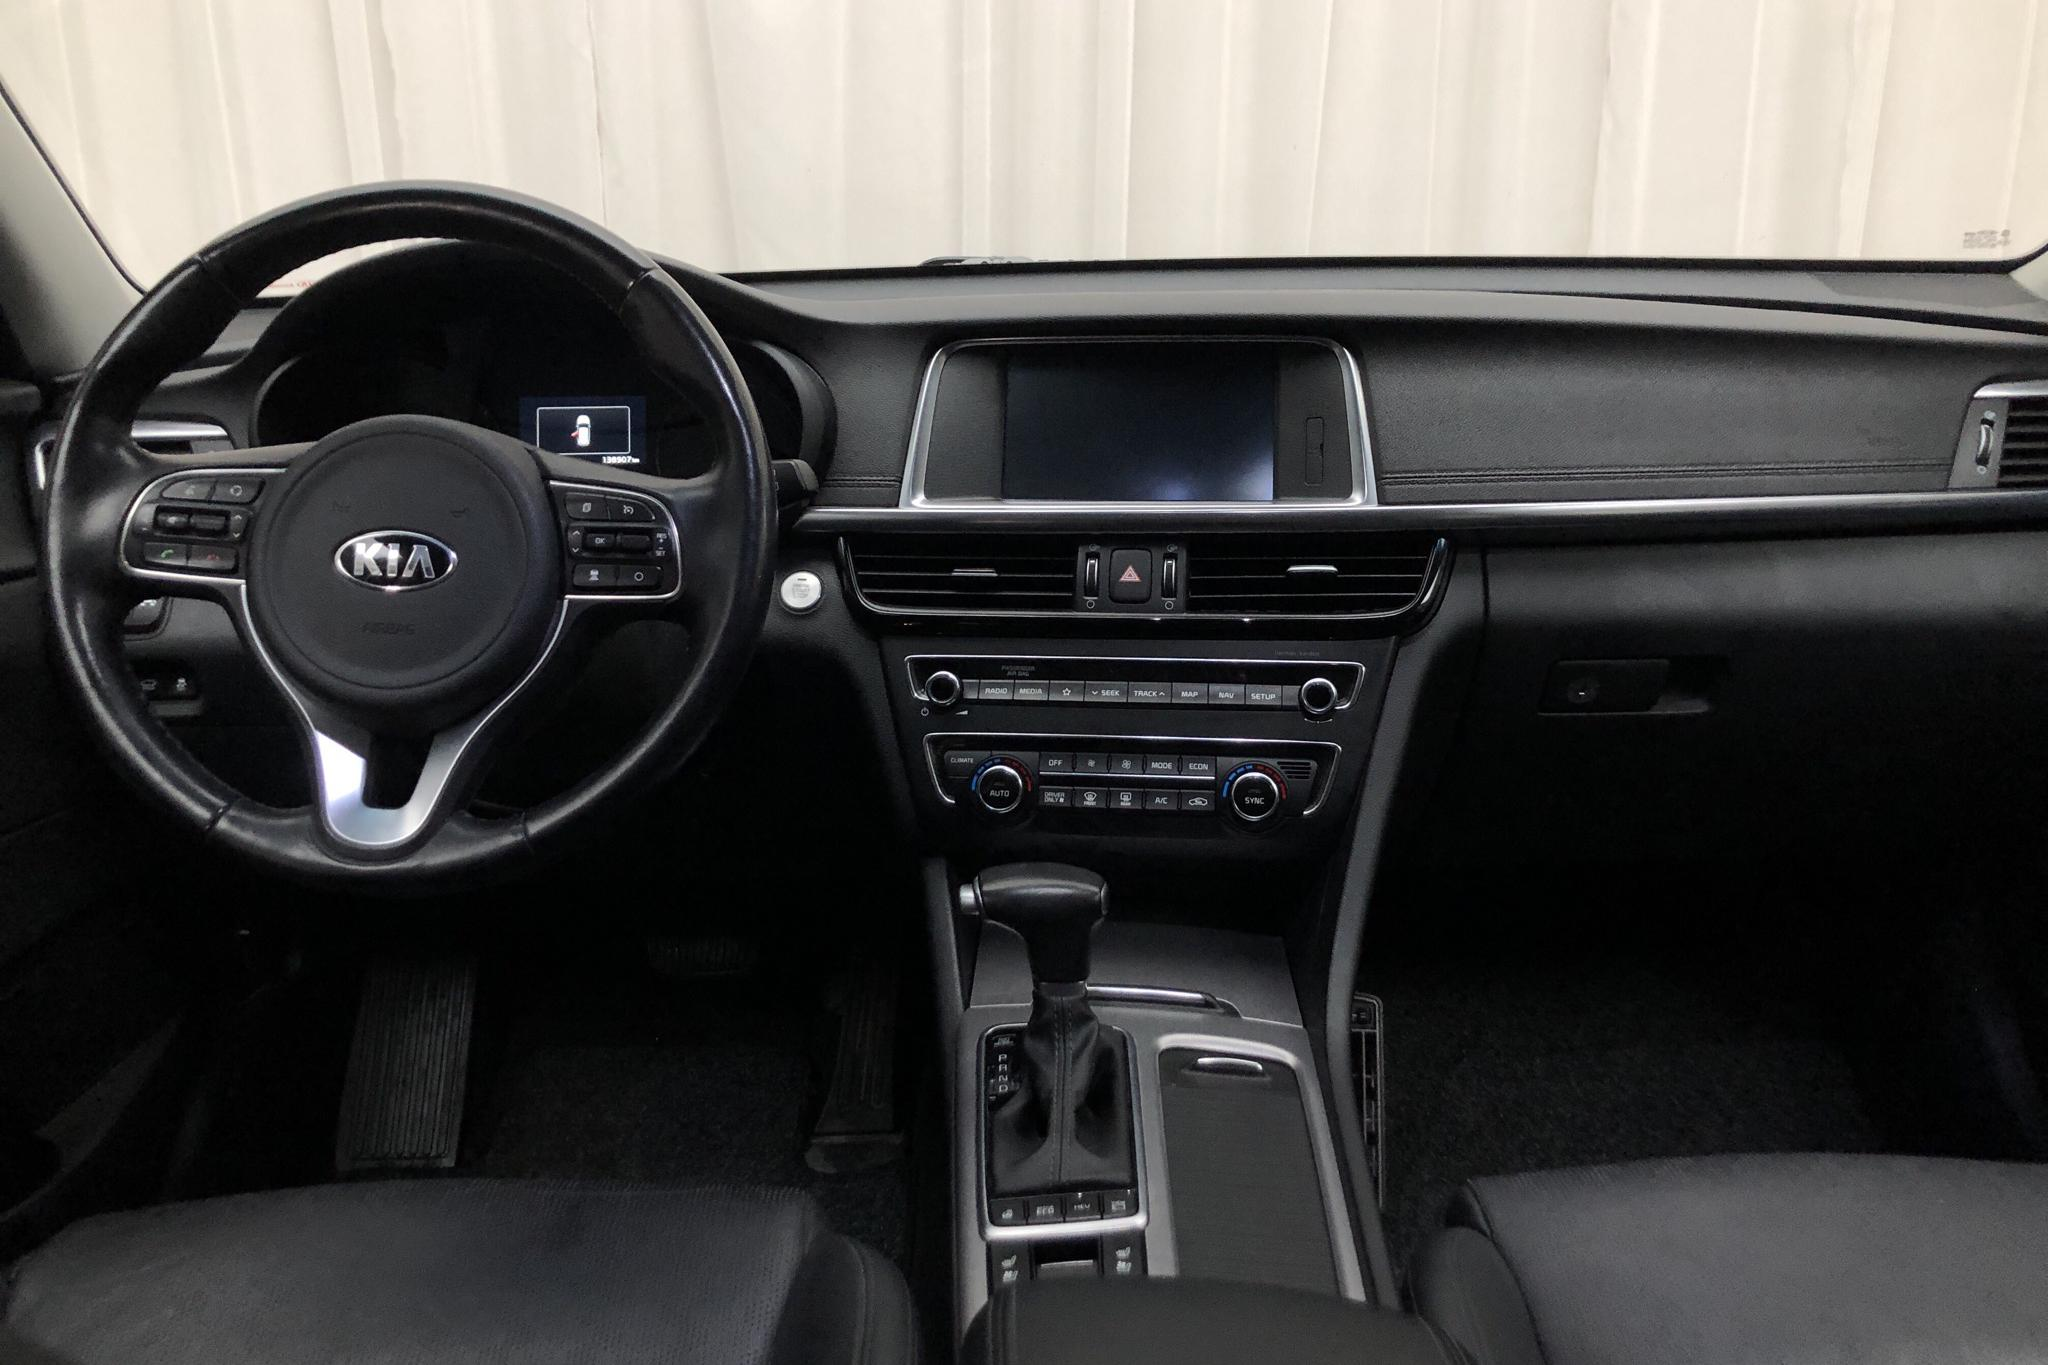 Kia Optima 2.0 GDi Plug-in Hybrid SW (205hk) - 138 920 km - Automatic - white - 2018